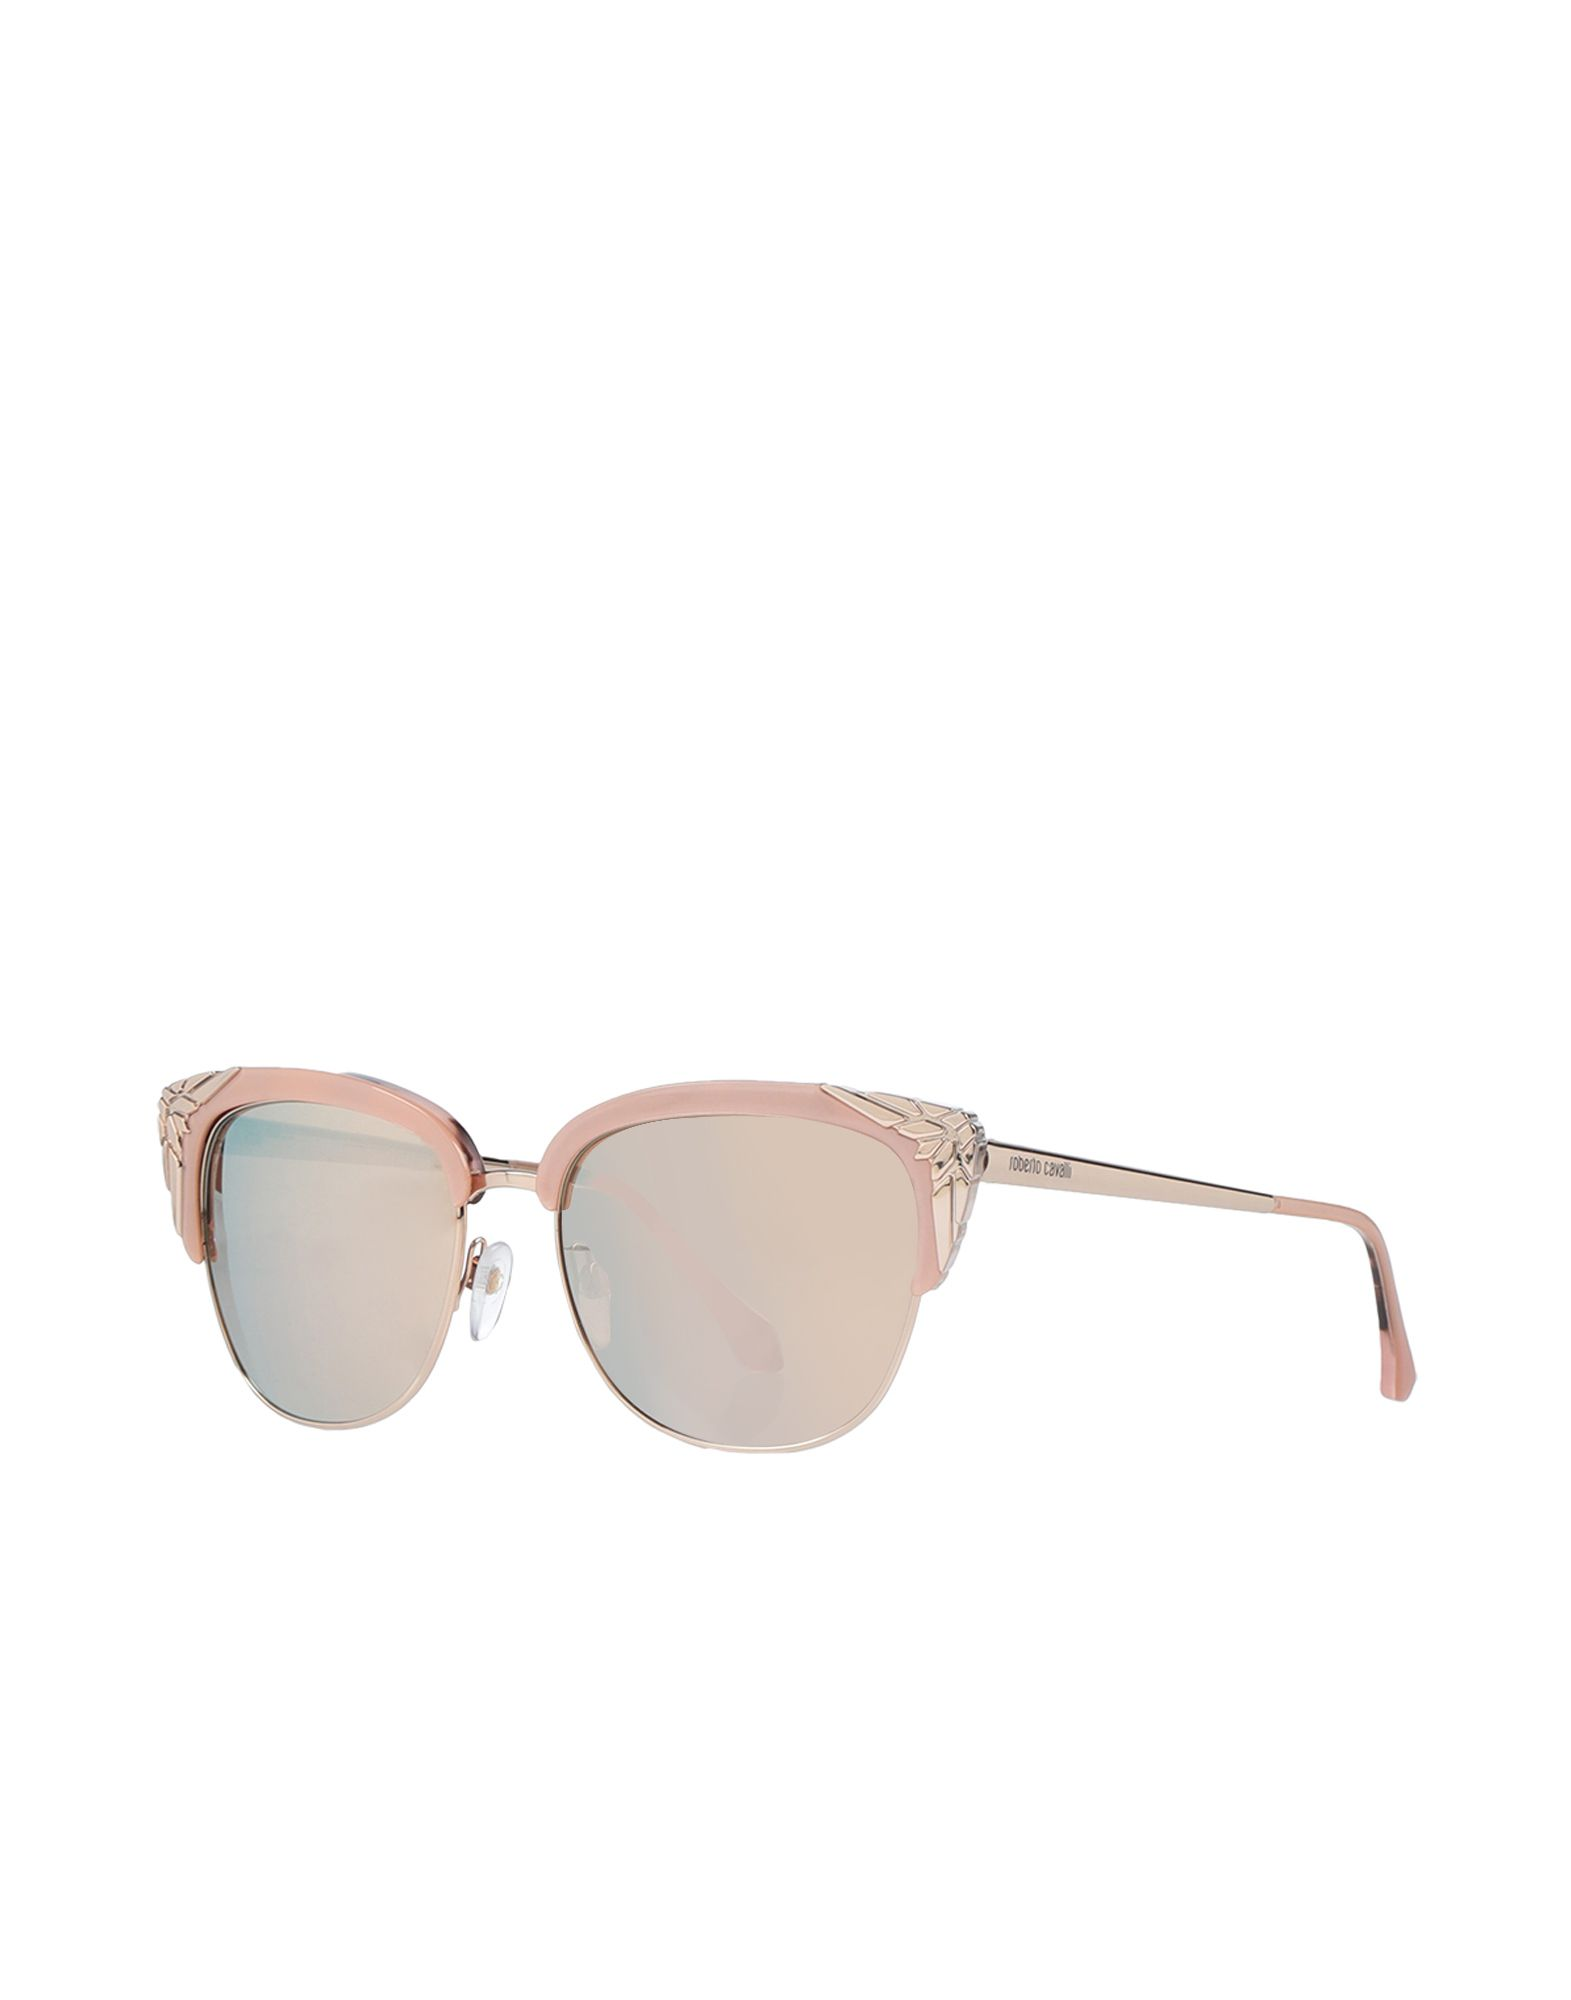 ROBERTO CAVALLI EYEWEAR Солнечные очки roberto cavalli eyewear солнечные очки